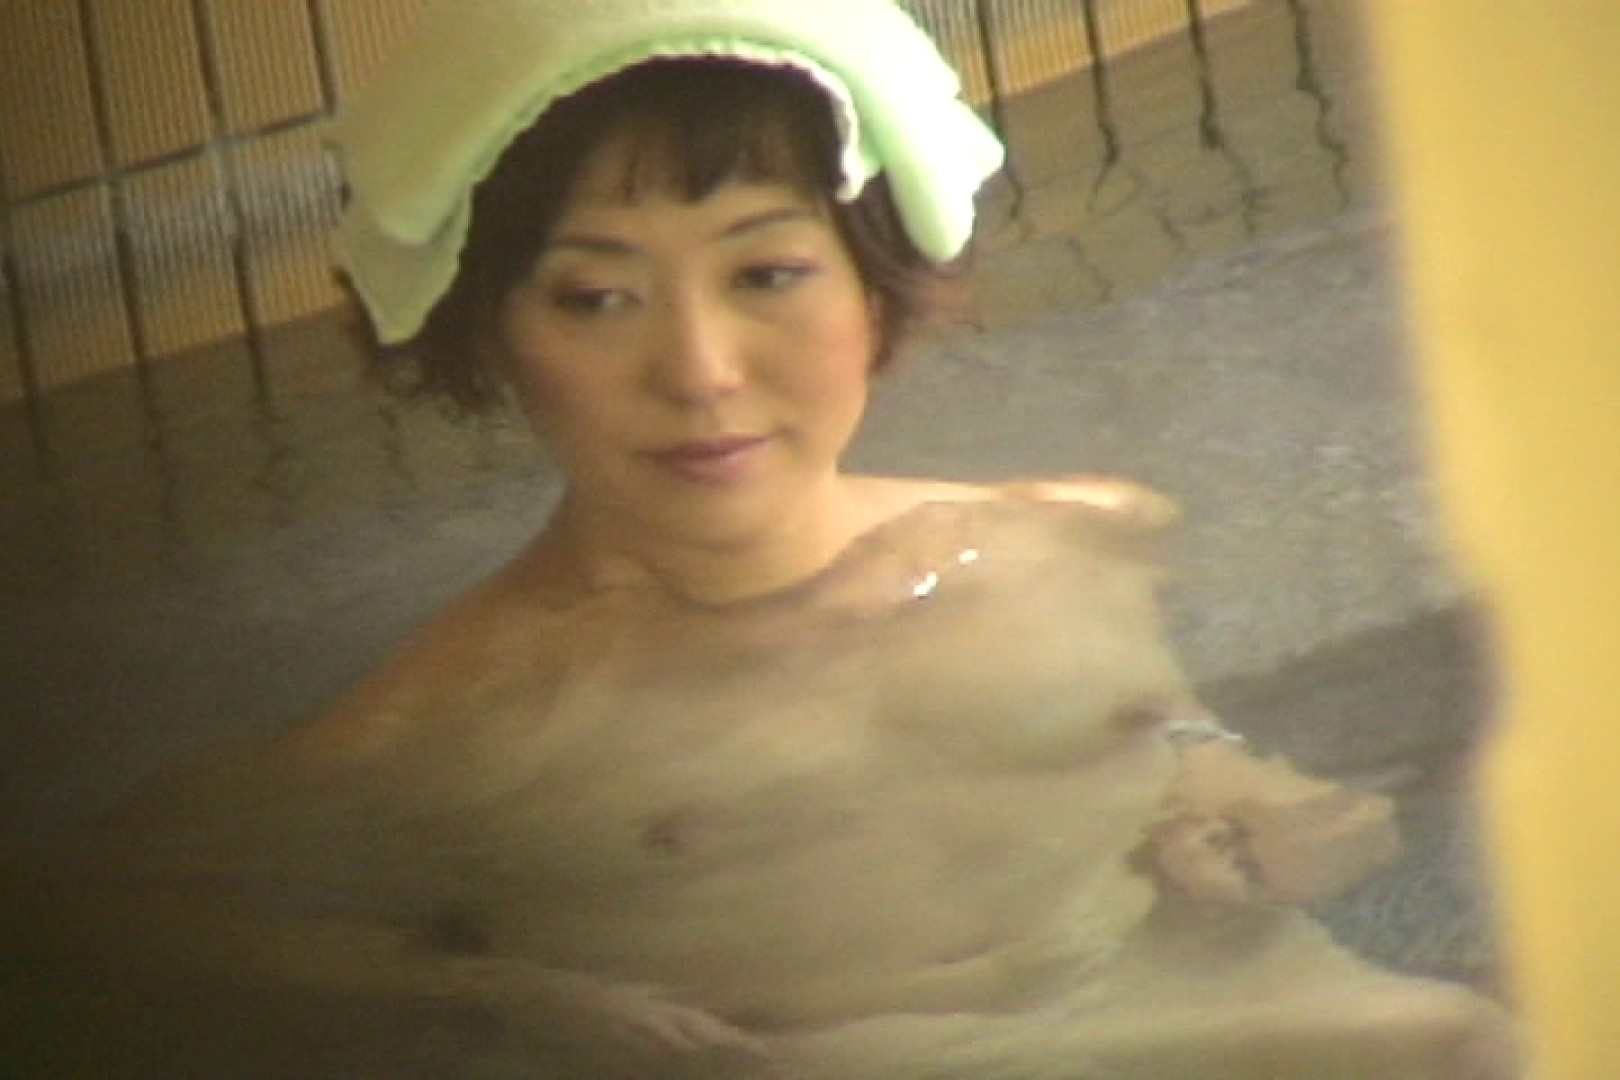 Aquaな露天風呂Vol.456 OL女体 戯れ無修正画像 47連発 41